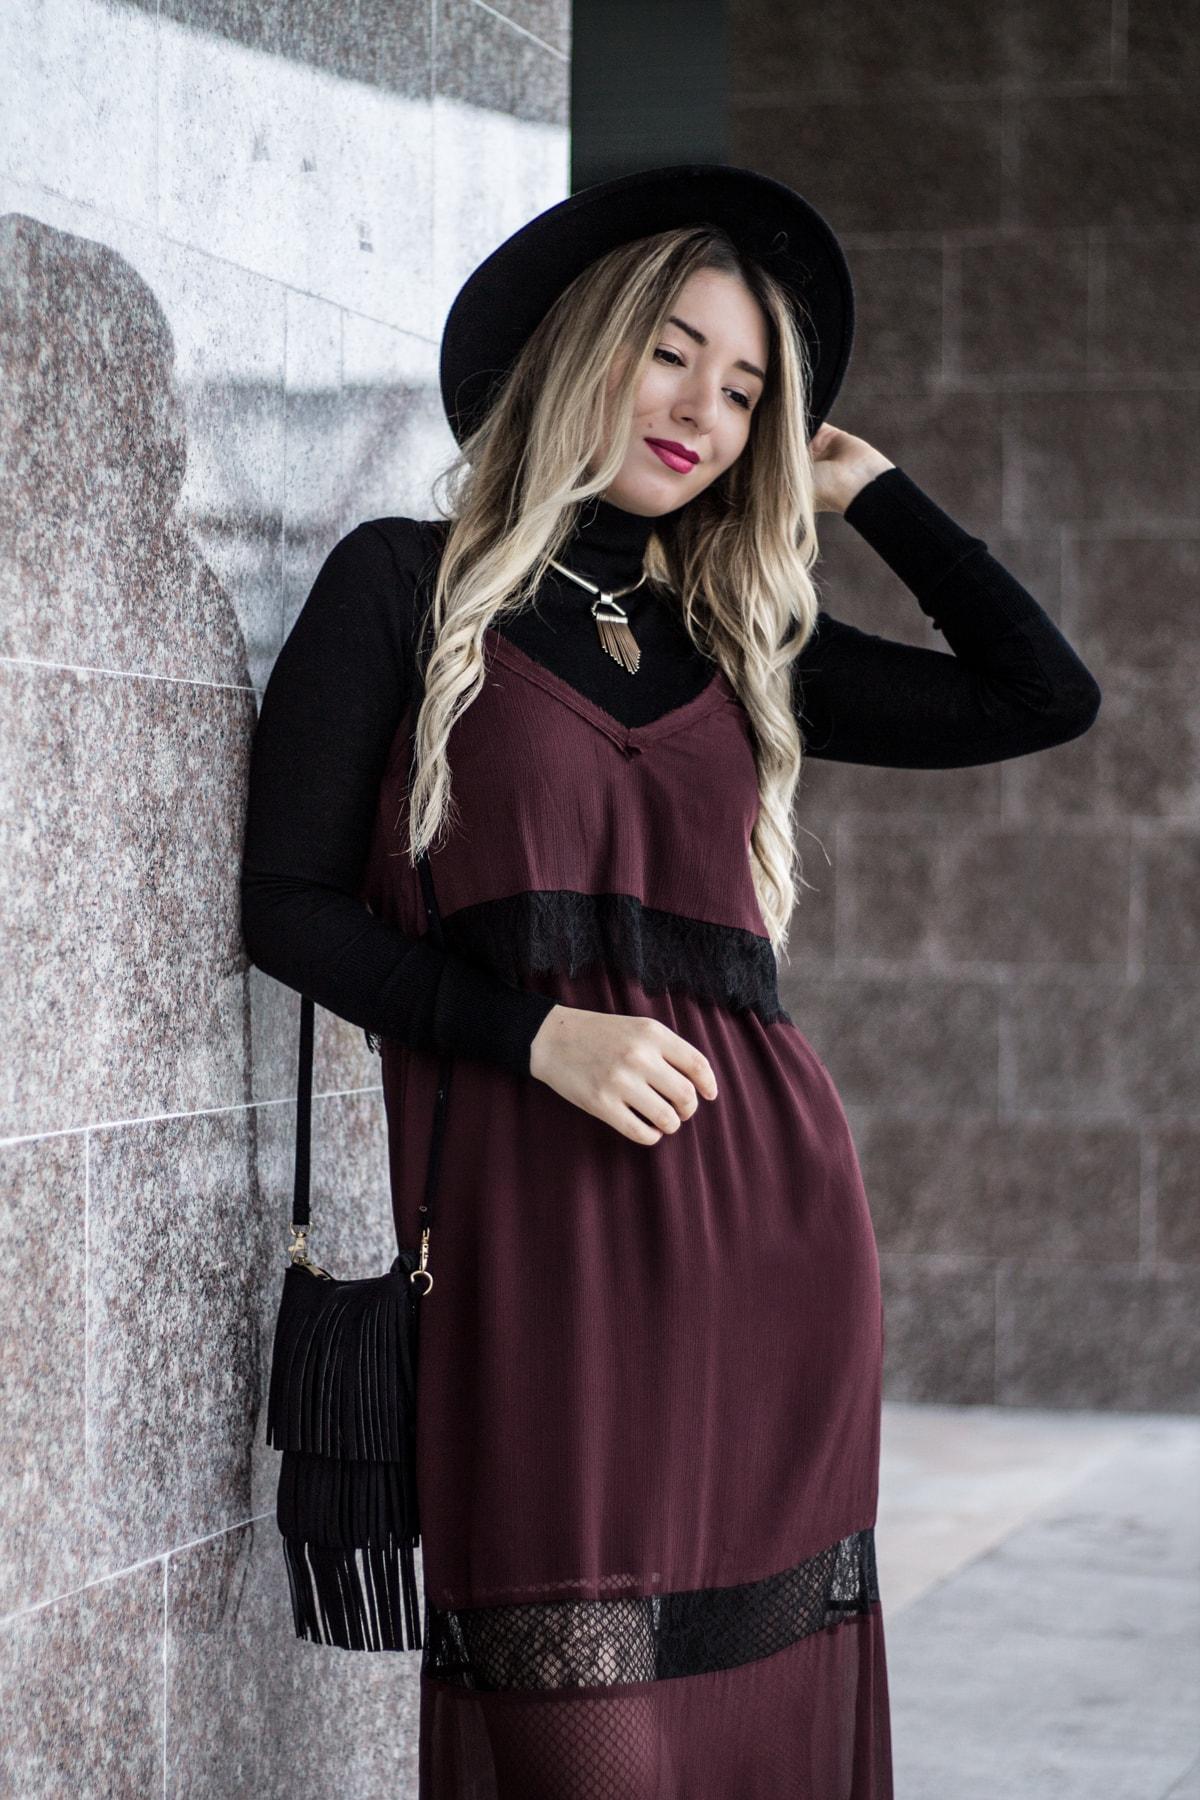 Tendinte in moda toamna iarna 2016/2017 - rochia furou purtata peste maleta - blogger Andreea Ristea